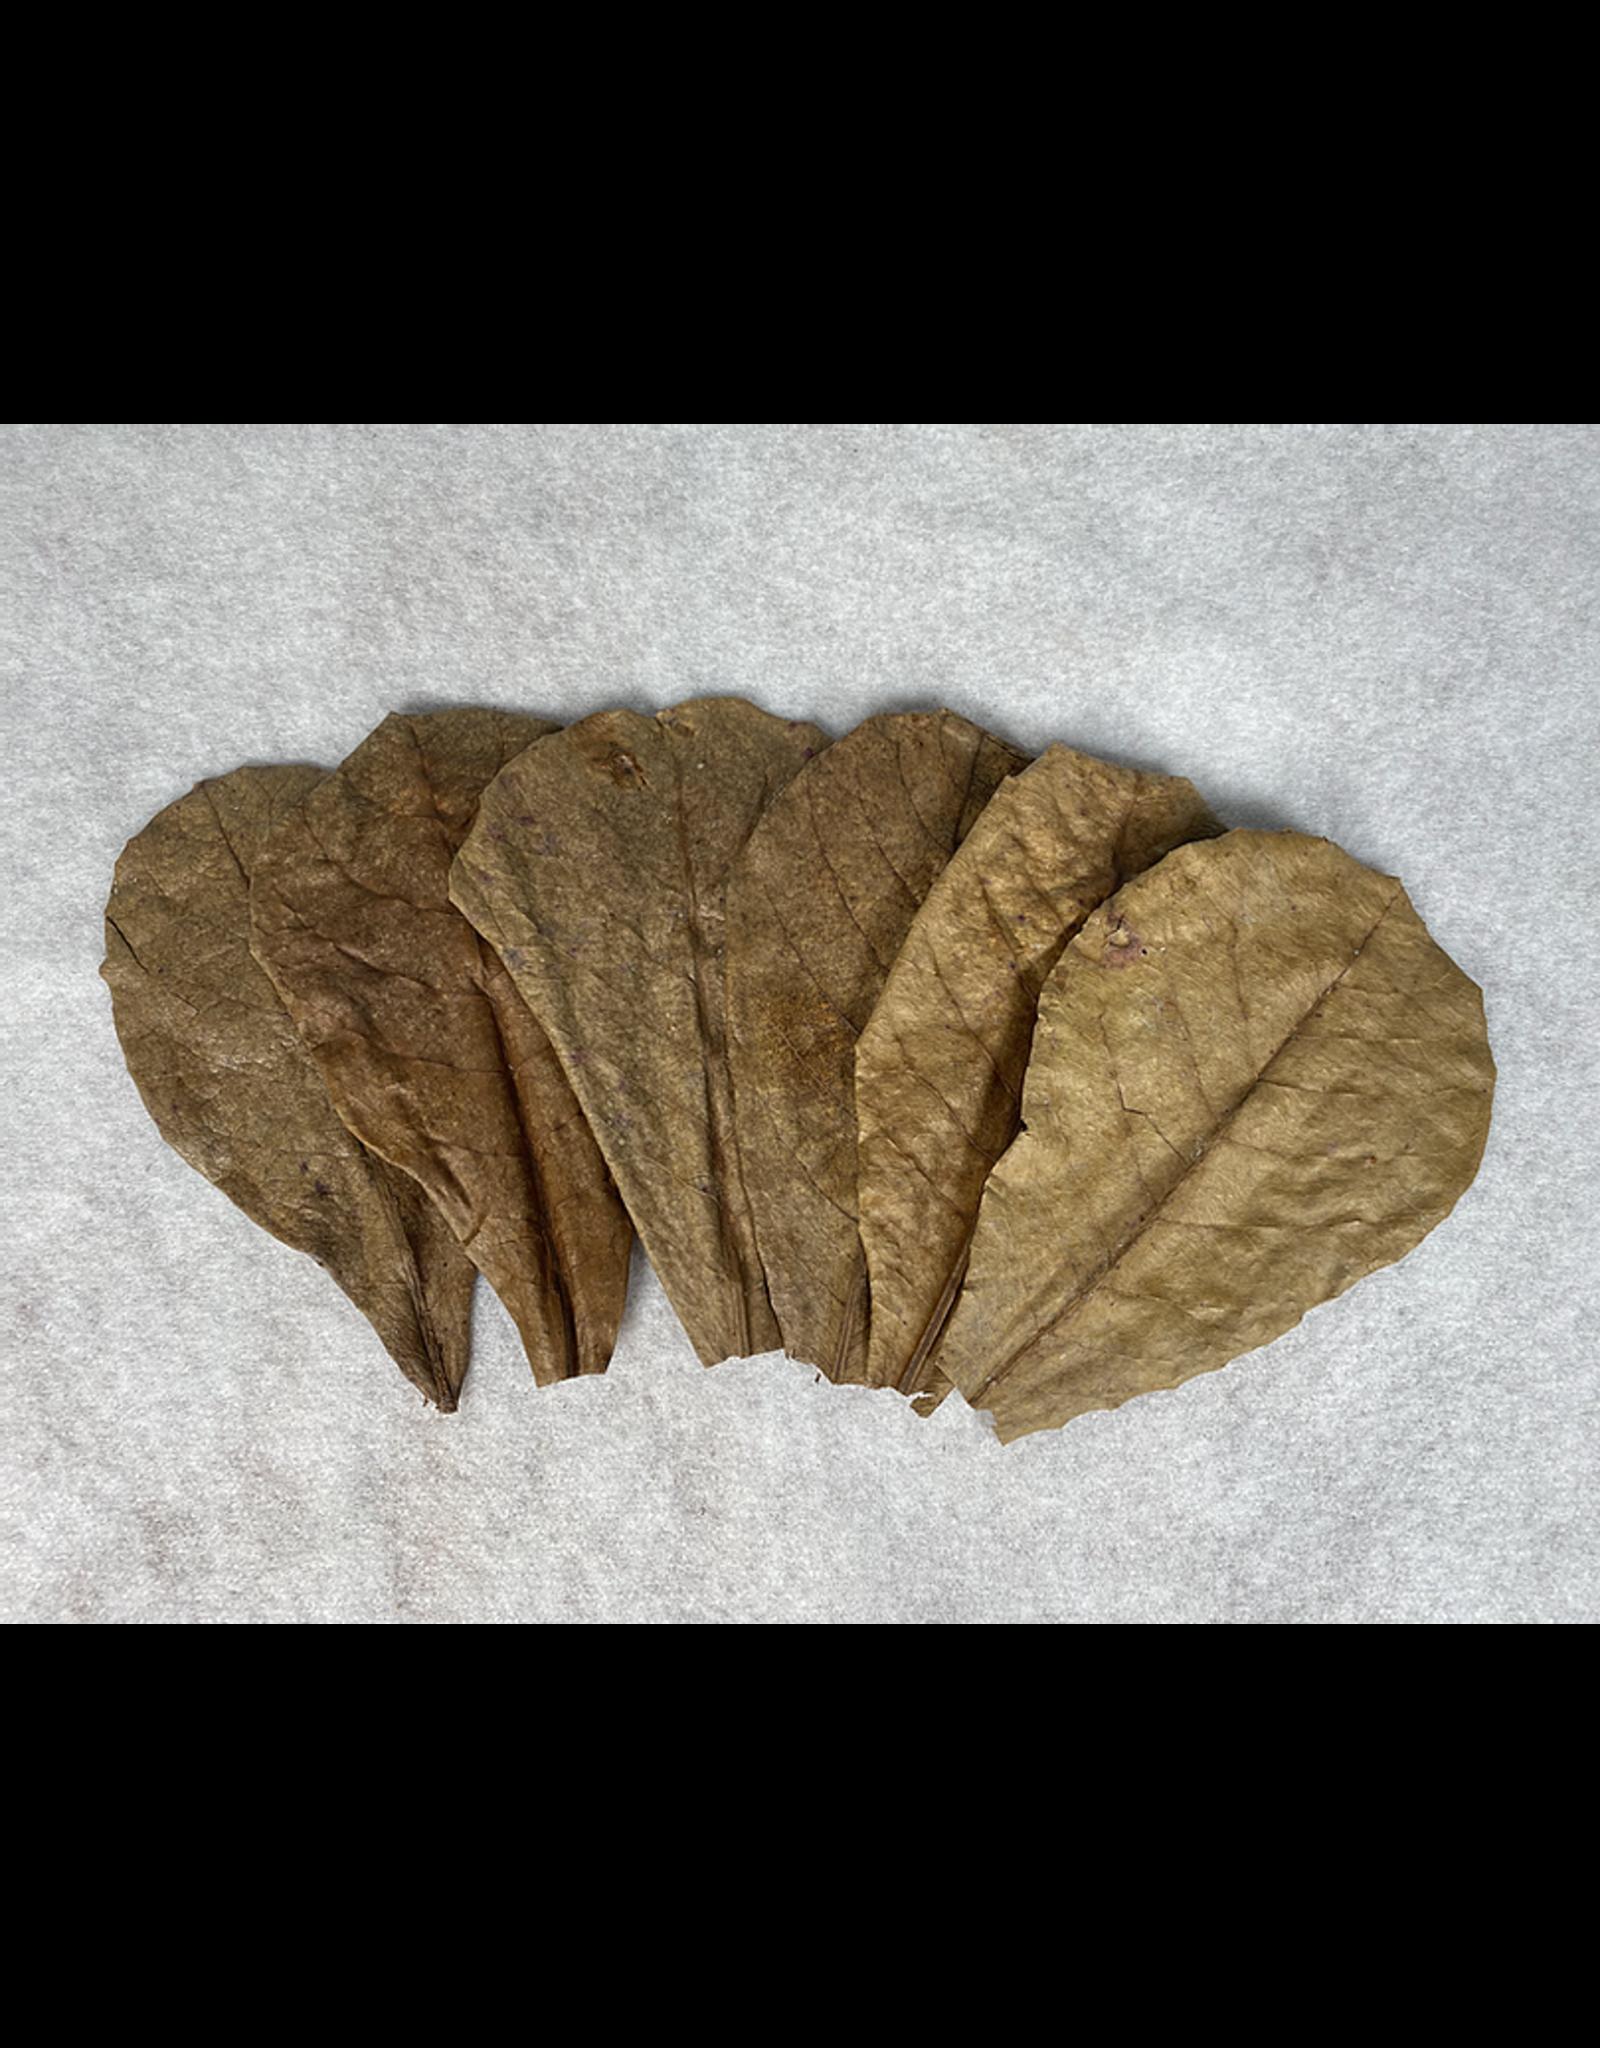 Catappa Canada CATAPPA CANADA Almond Leaves 6 pack